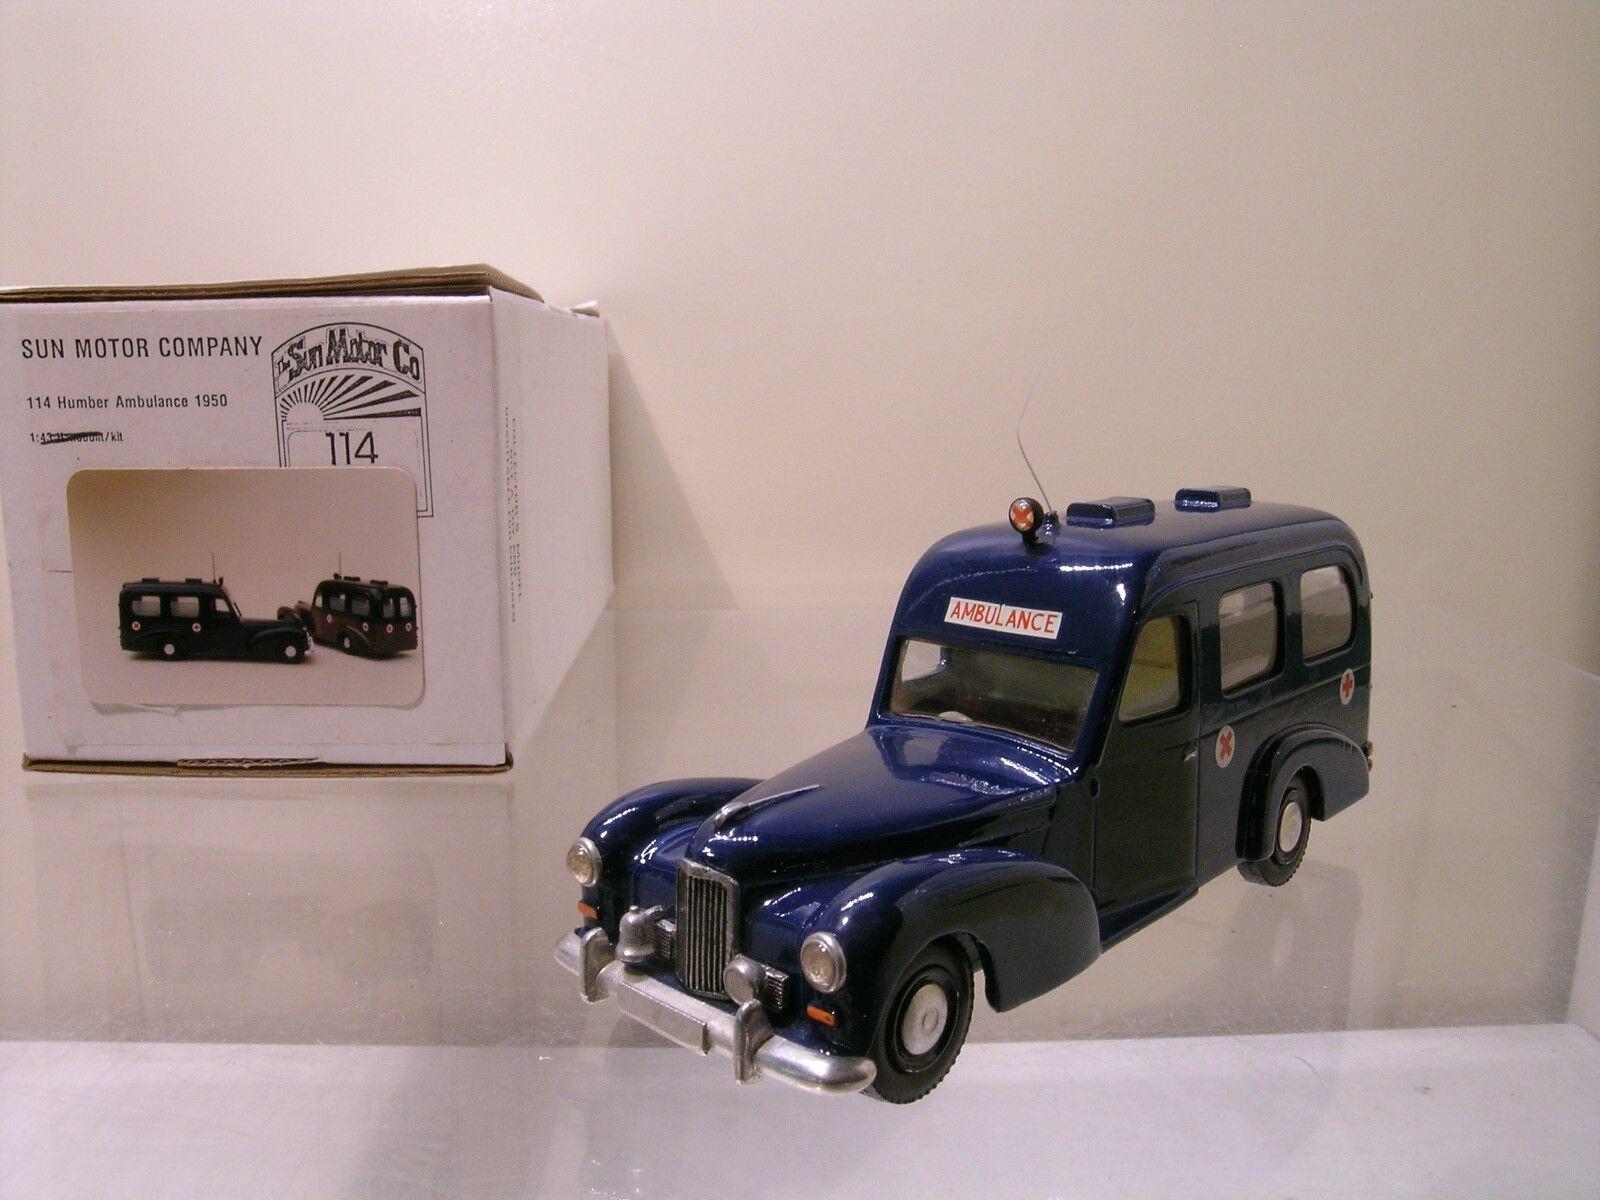 SUN MOTOR COMPANY 114 HUMBER AMBULANCE 1950 bleu RESIN HANDBUILT BOXED 1 43